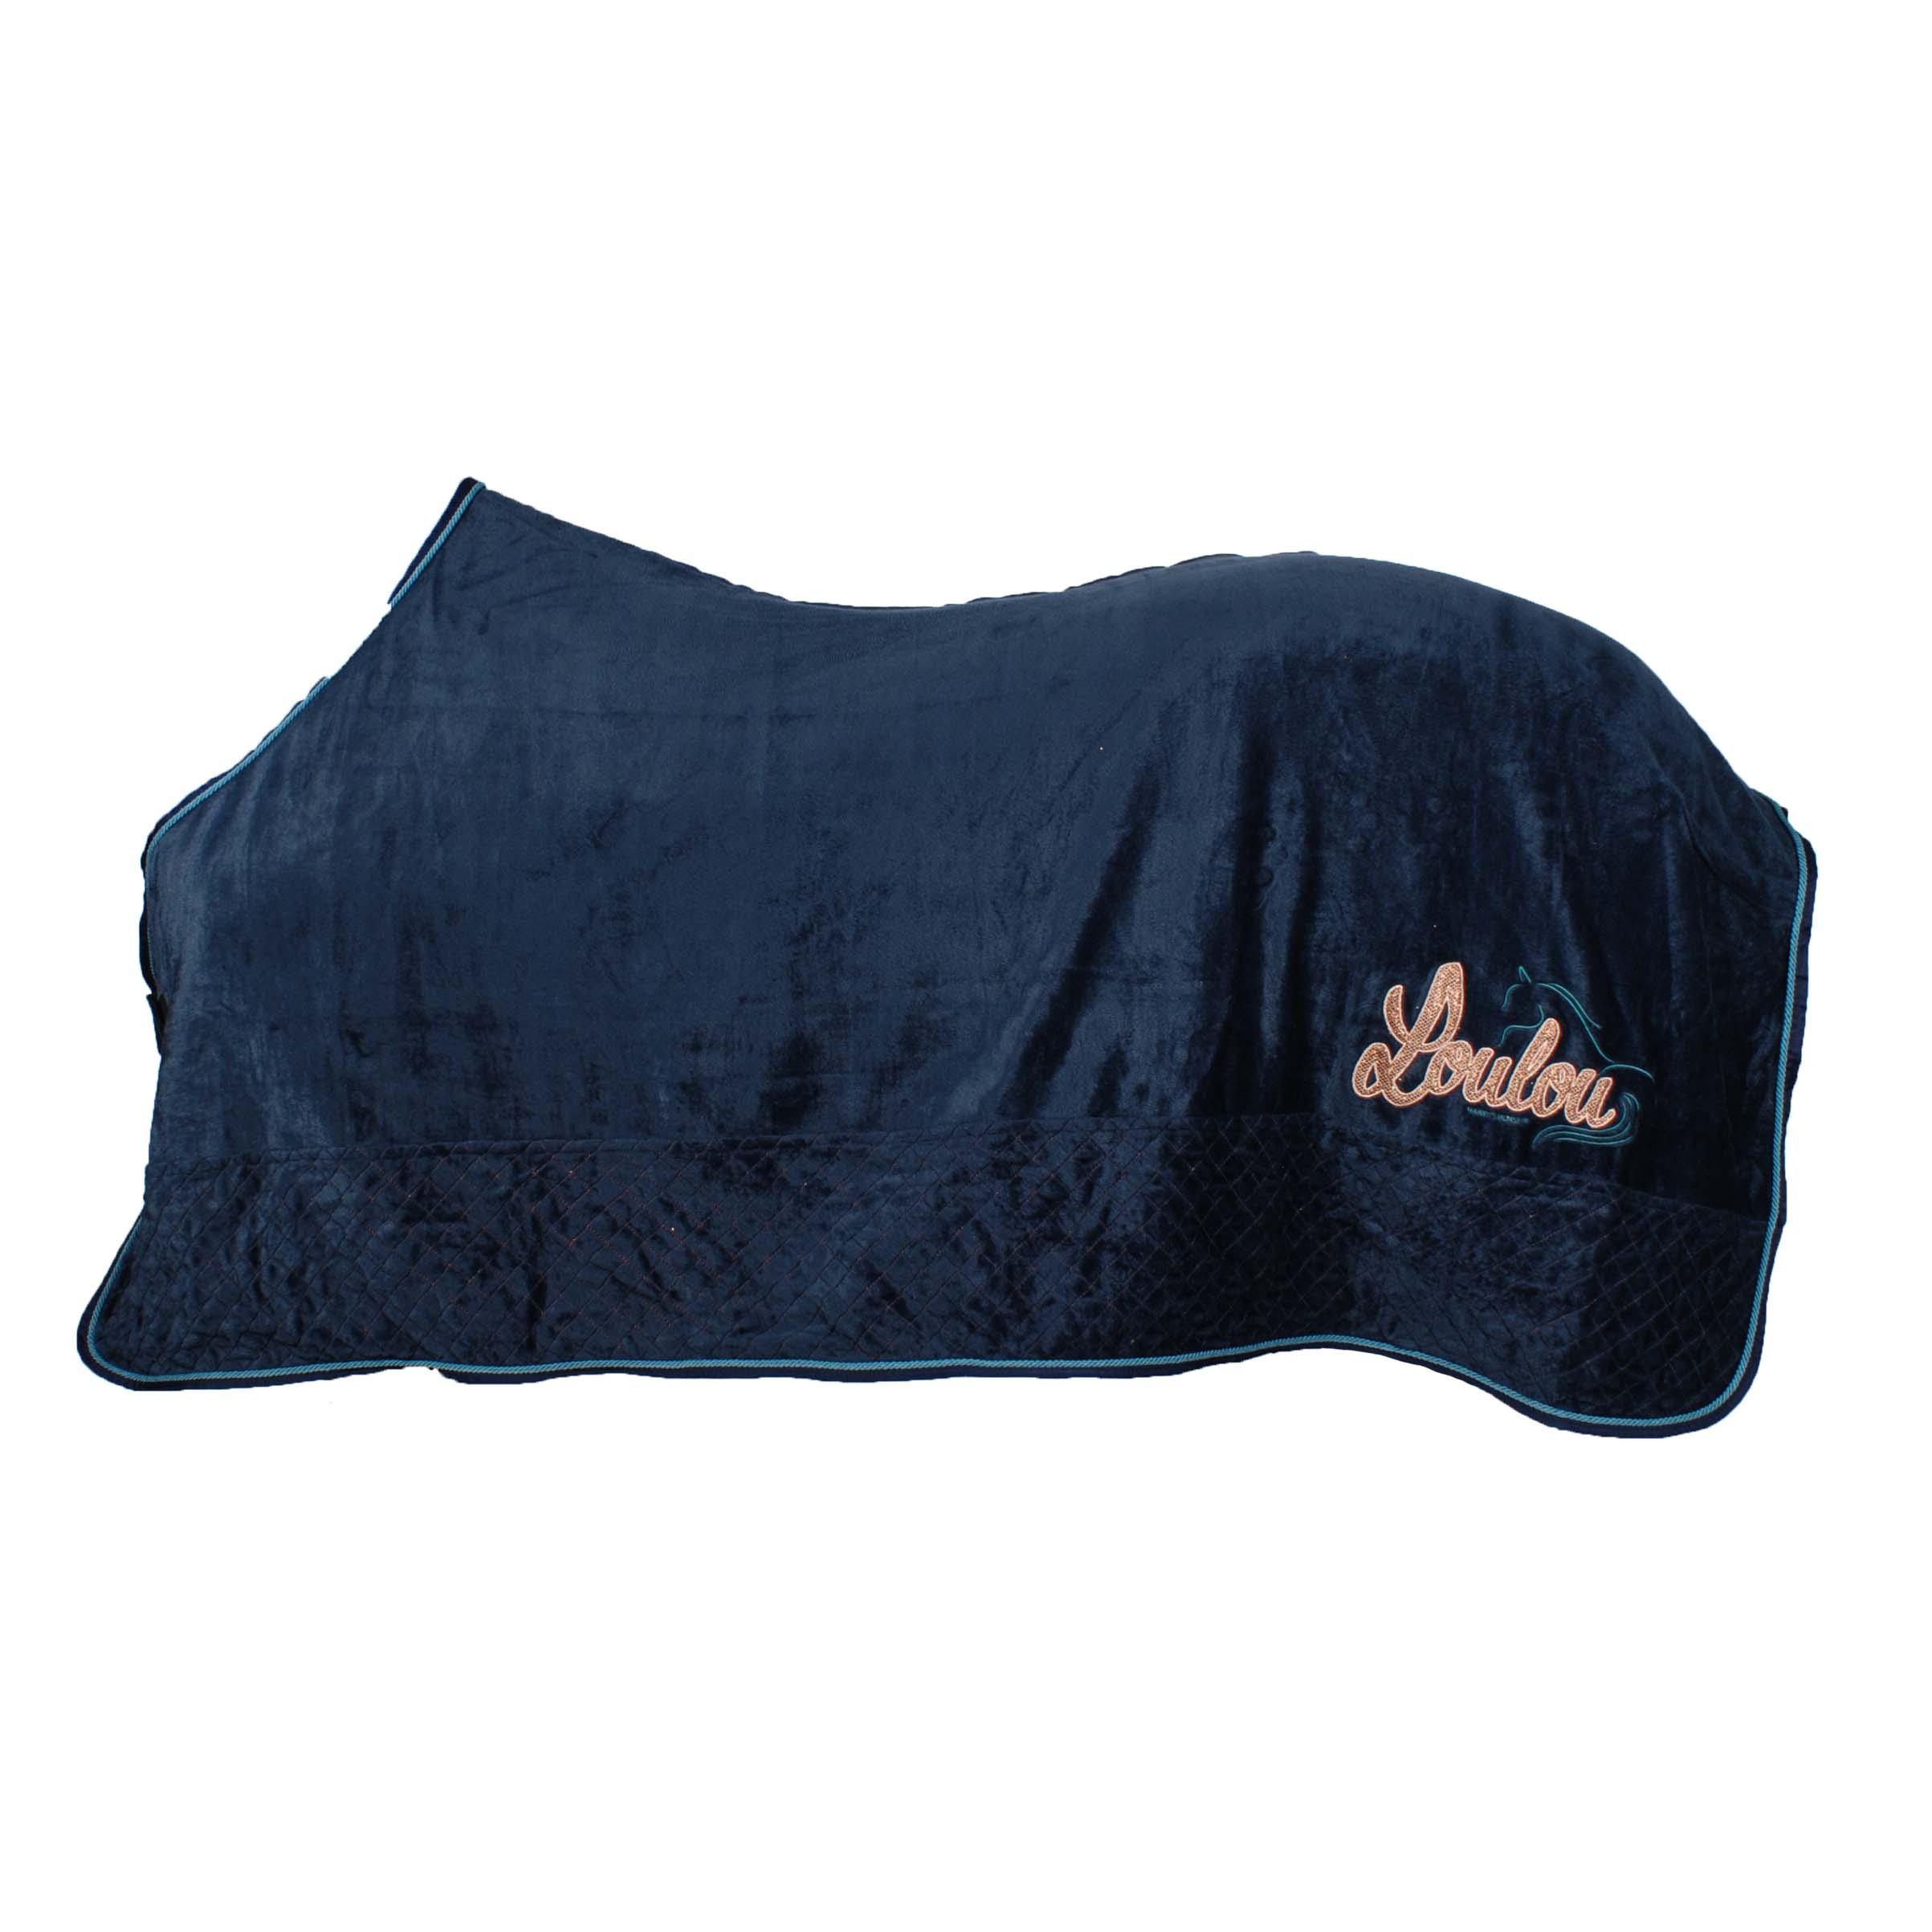 Harrys Horse Loulou NJ20 fleece deken donkerblauw maat:165